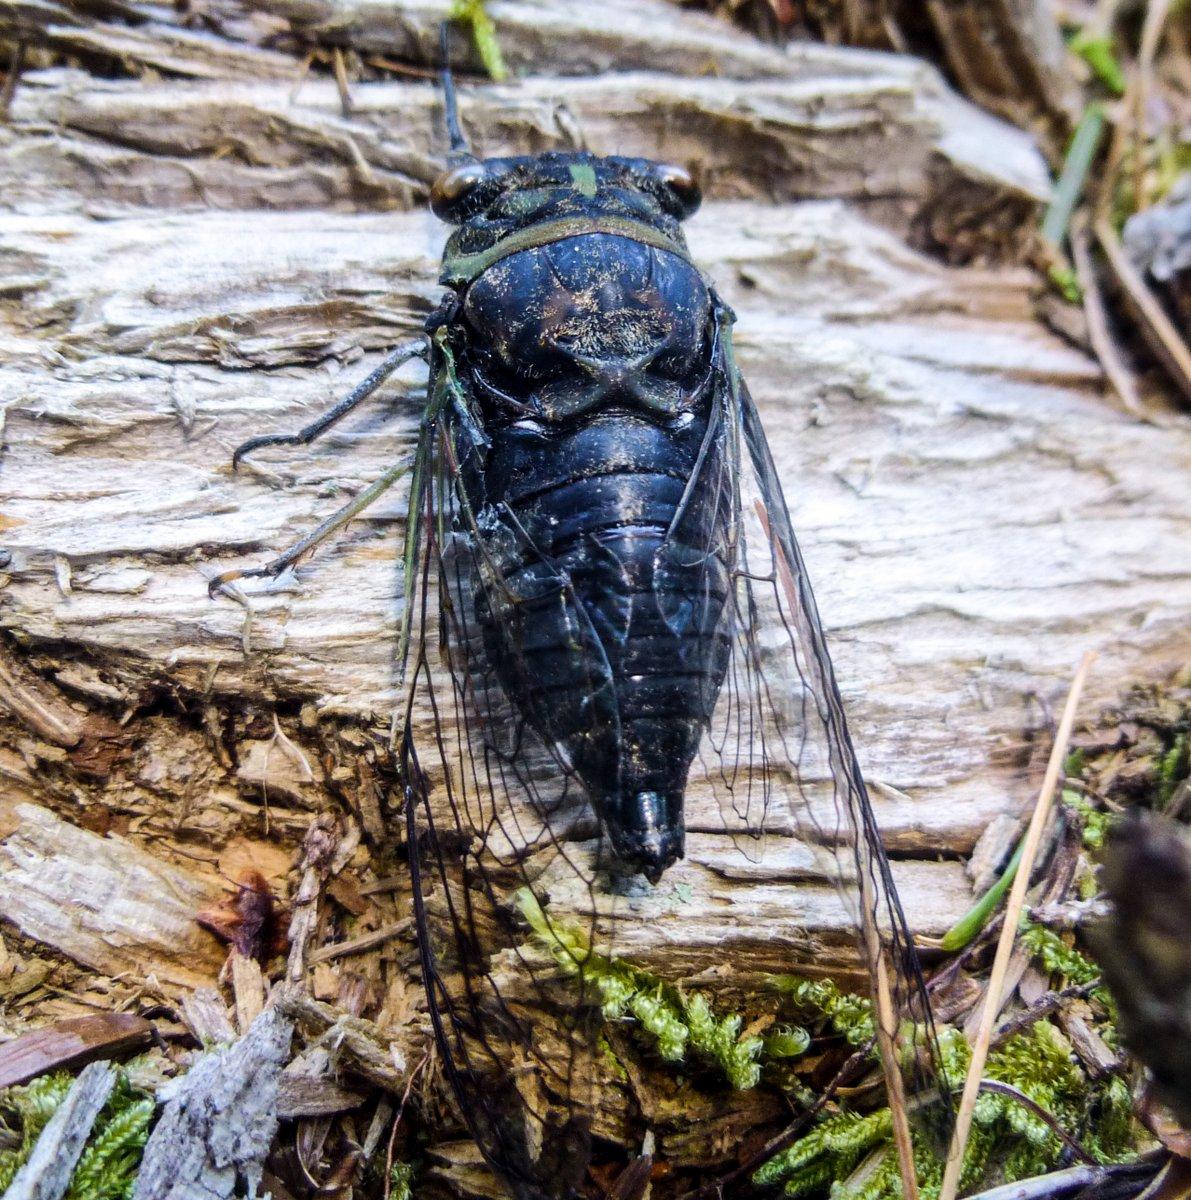 6. Cicada